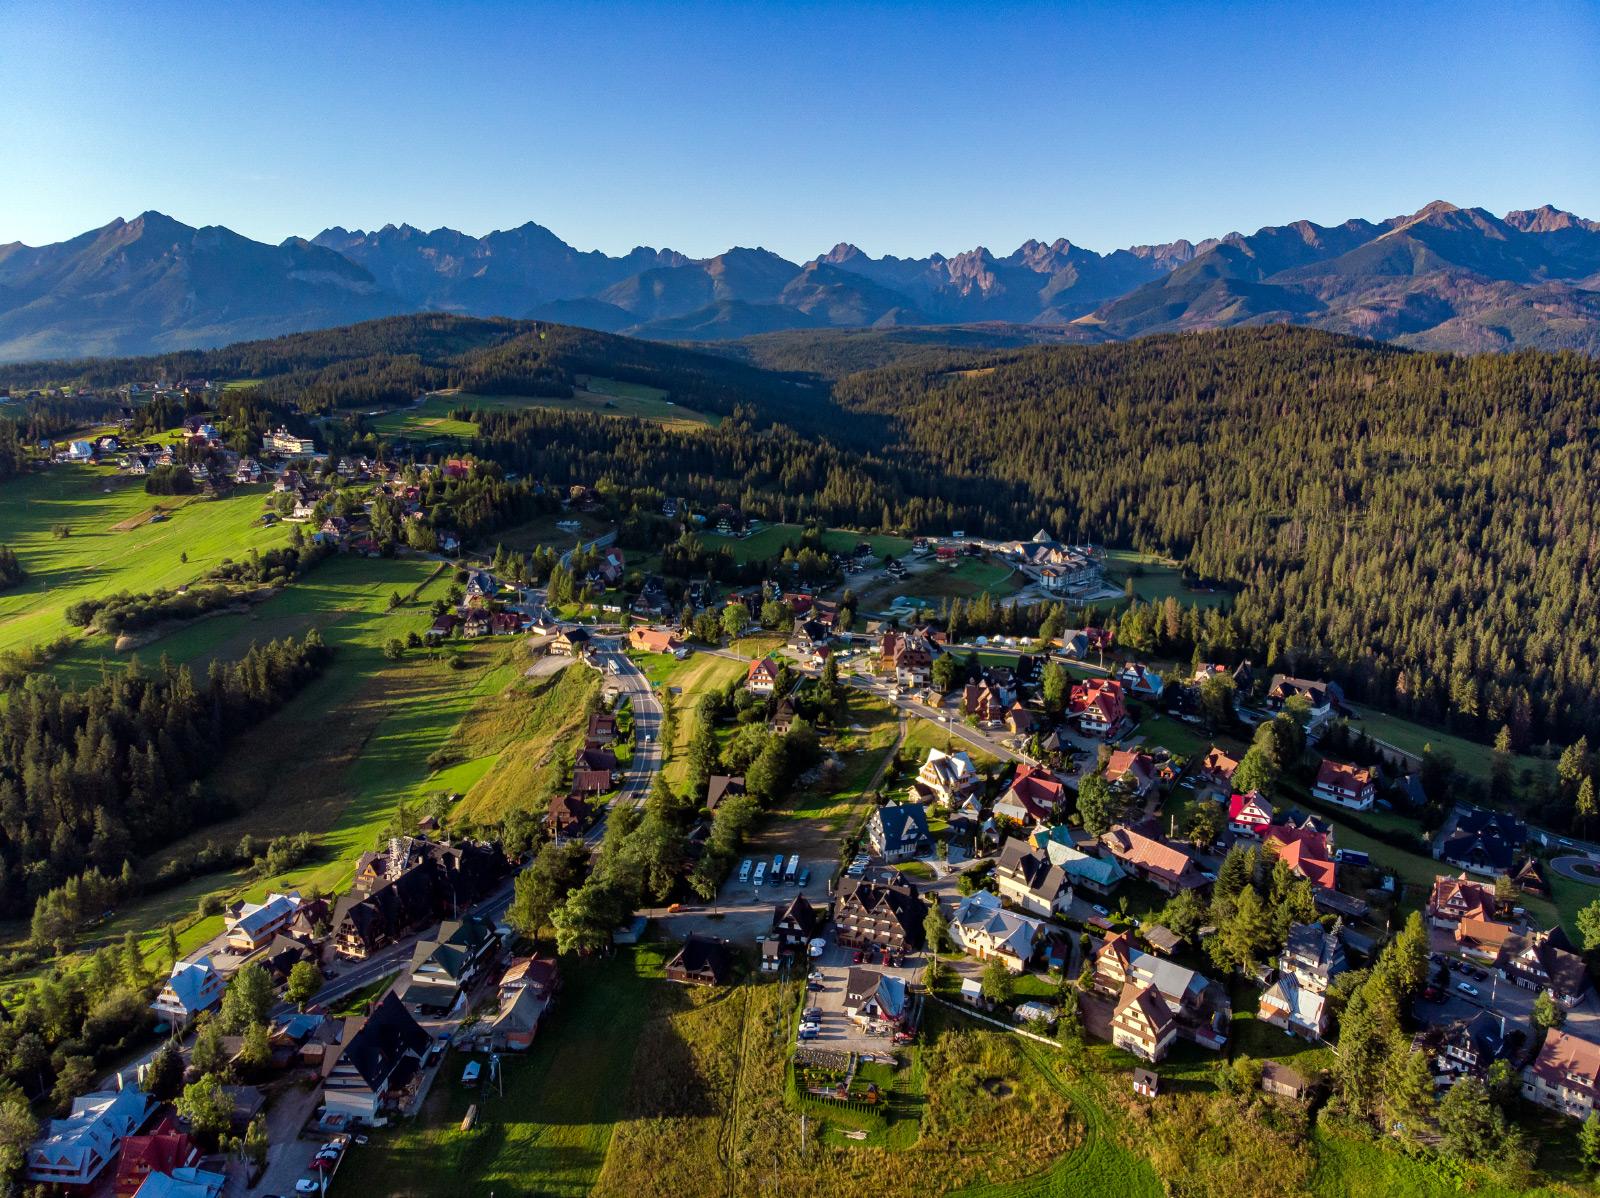 View of the Tatra Mountains from Bukowina Tatrzańska